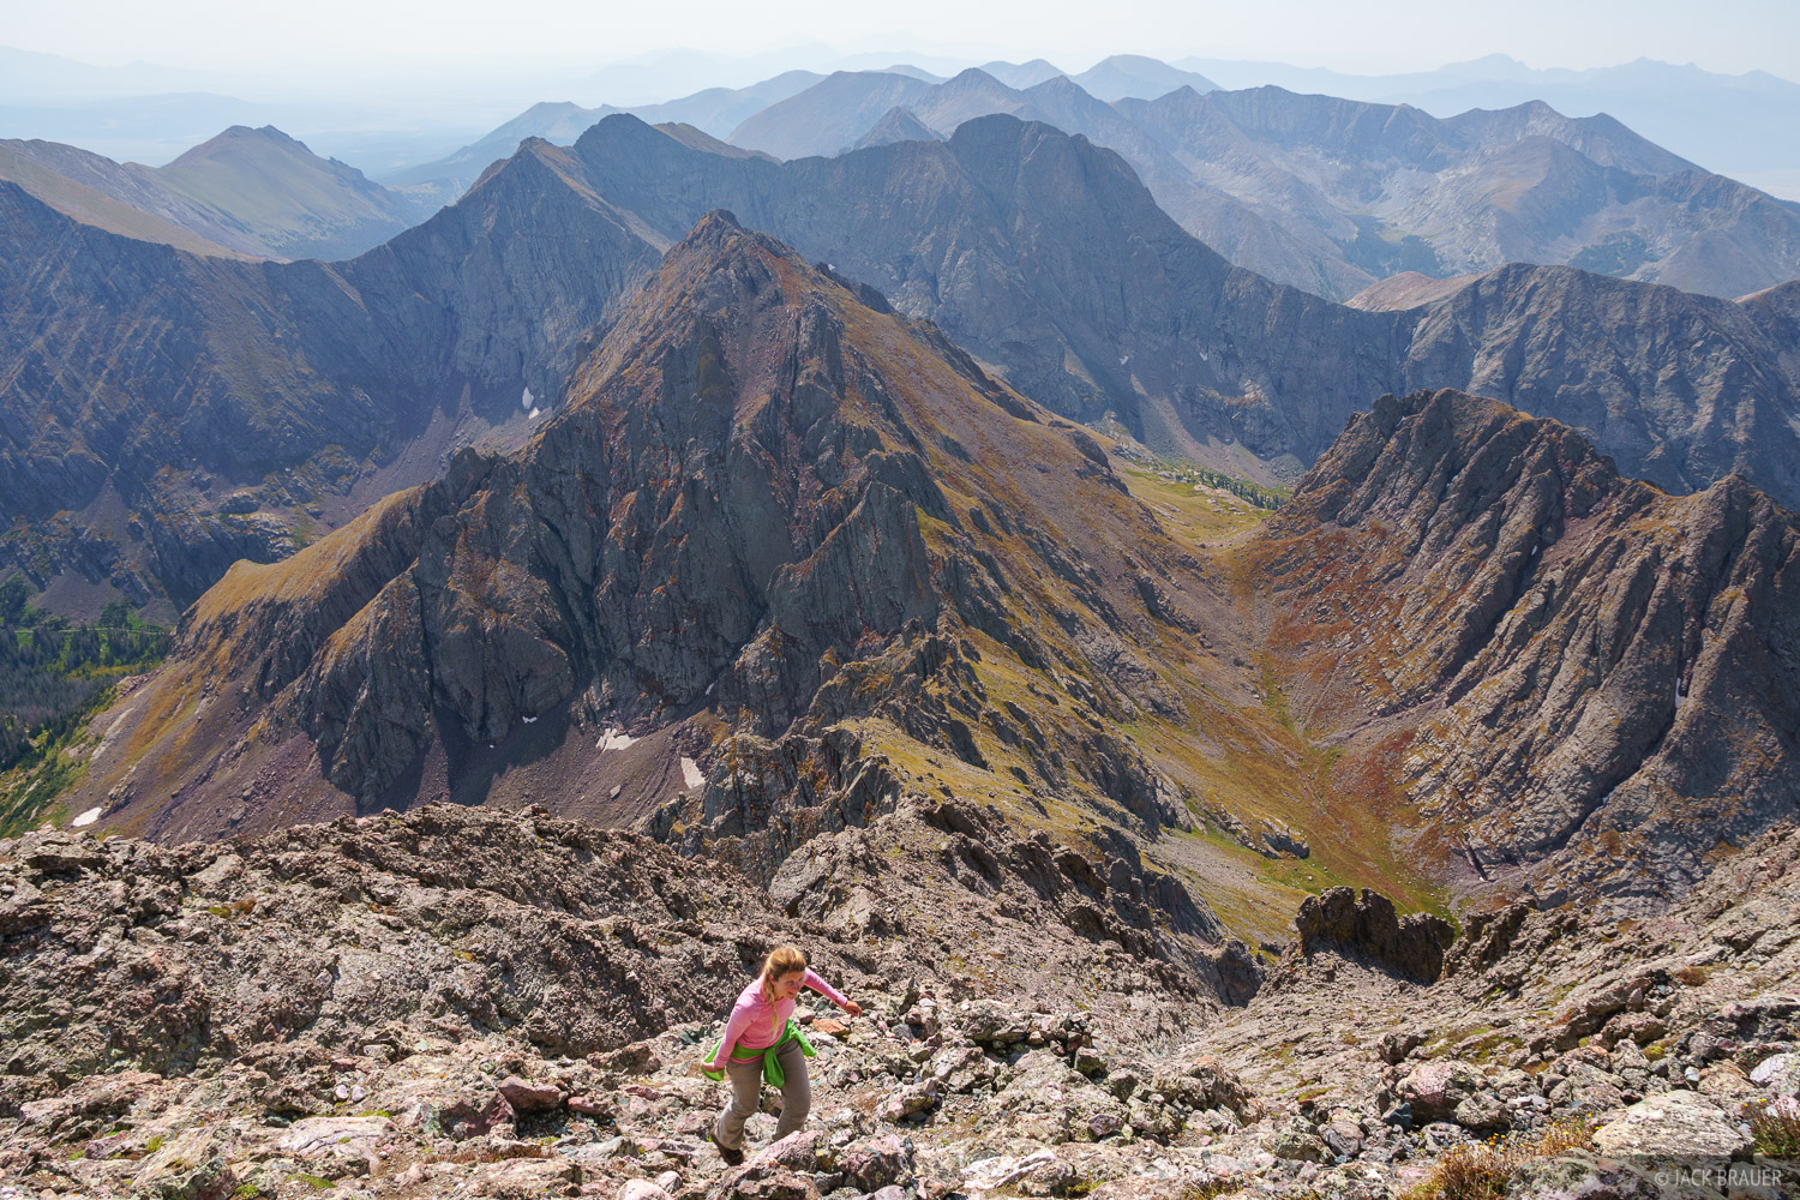 Broken Hand Peak, Colorado, Crestone Needle, Sangre de Cristos, 14er, hiking, Sangre de Cristo Wilderness, photo